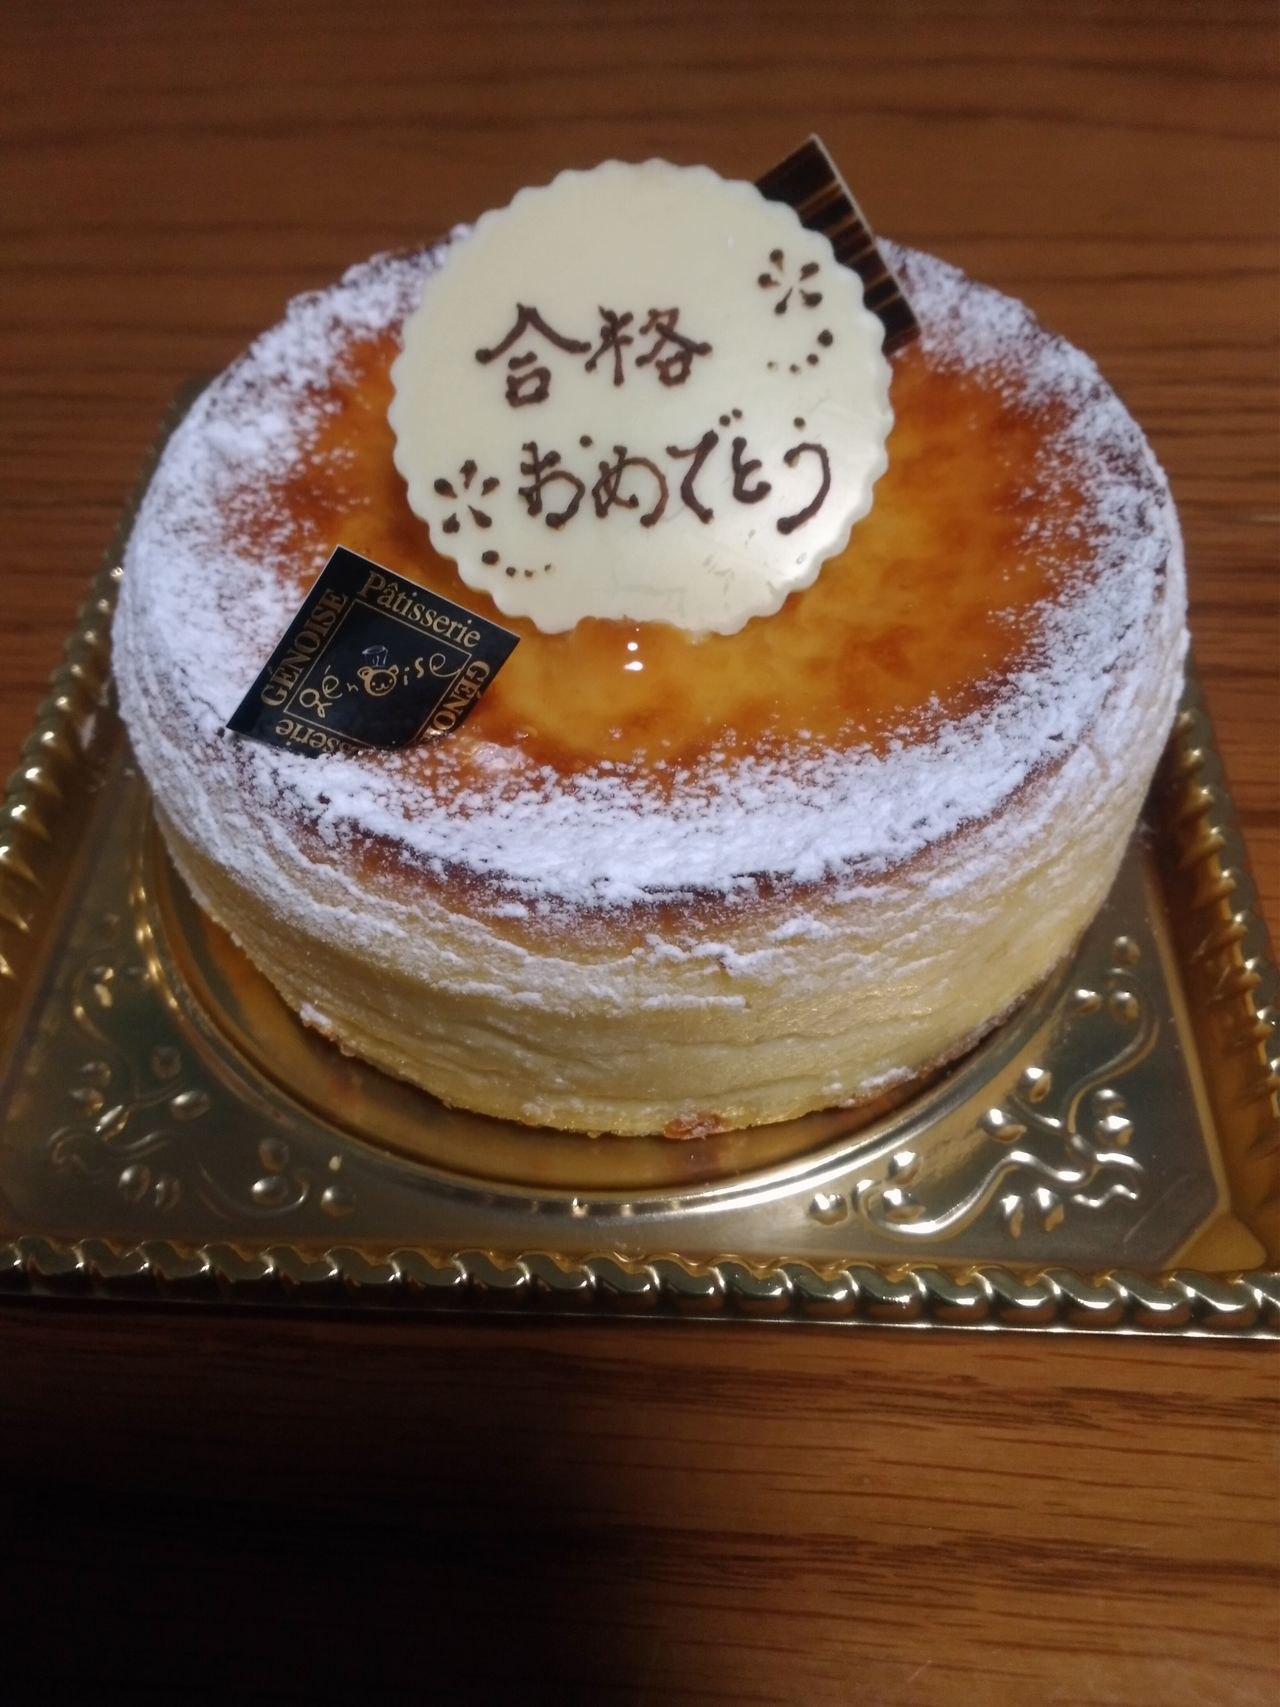 Dessert Japan 高崎市 群馬 群馬県 Asus Zenfone3 日本 Android Cheese Cake Cake ケーキ 合格祝 おめでとう